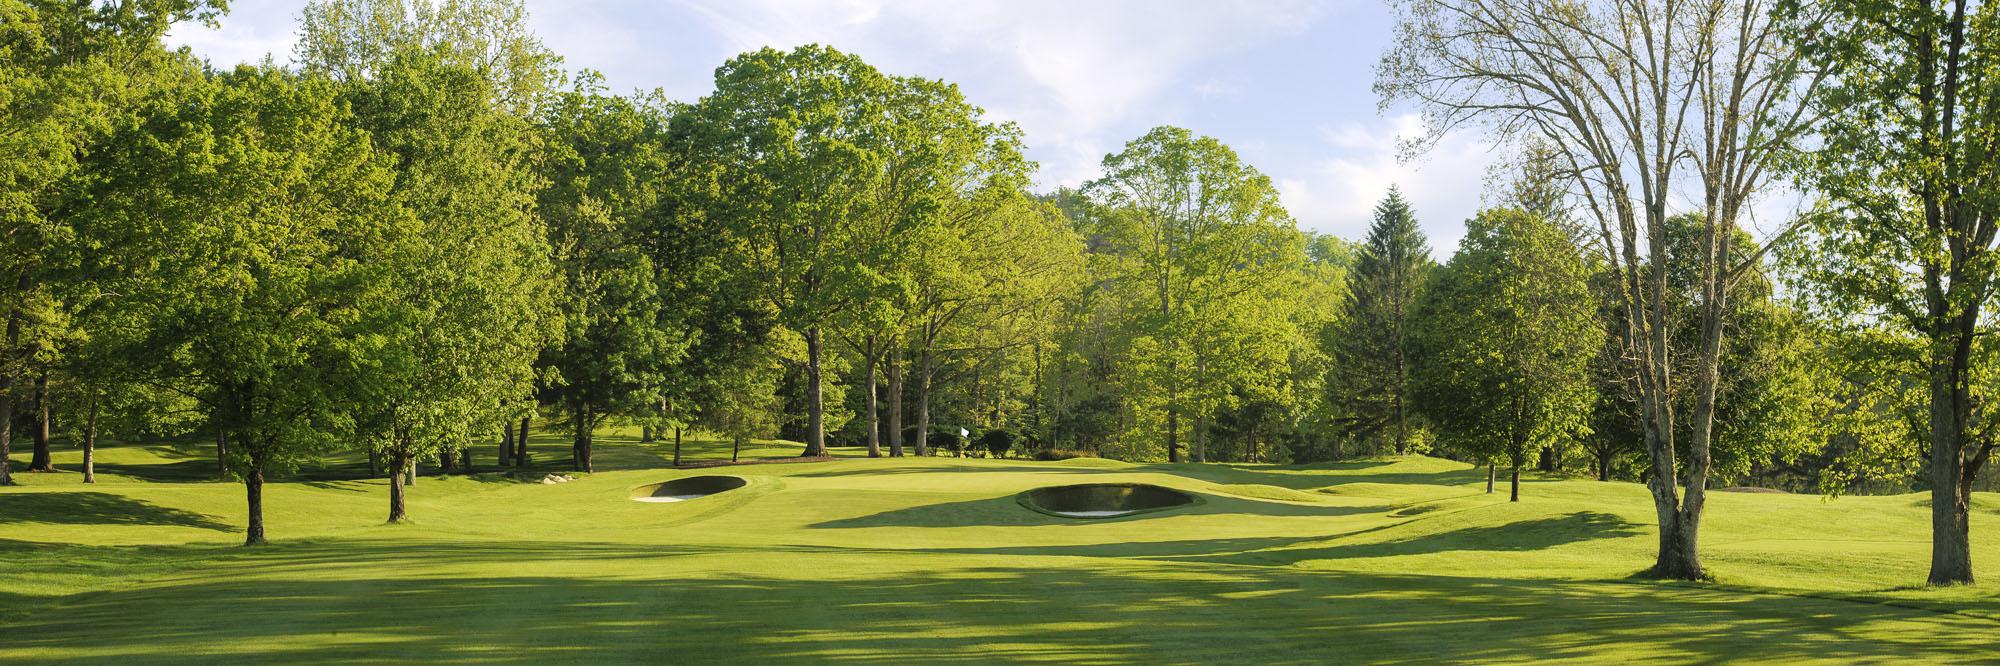 Golf Course Image - The Greenbrier Meadows Course No. 9